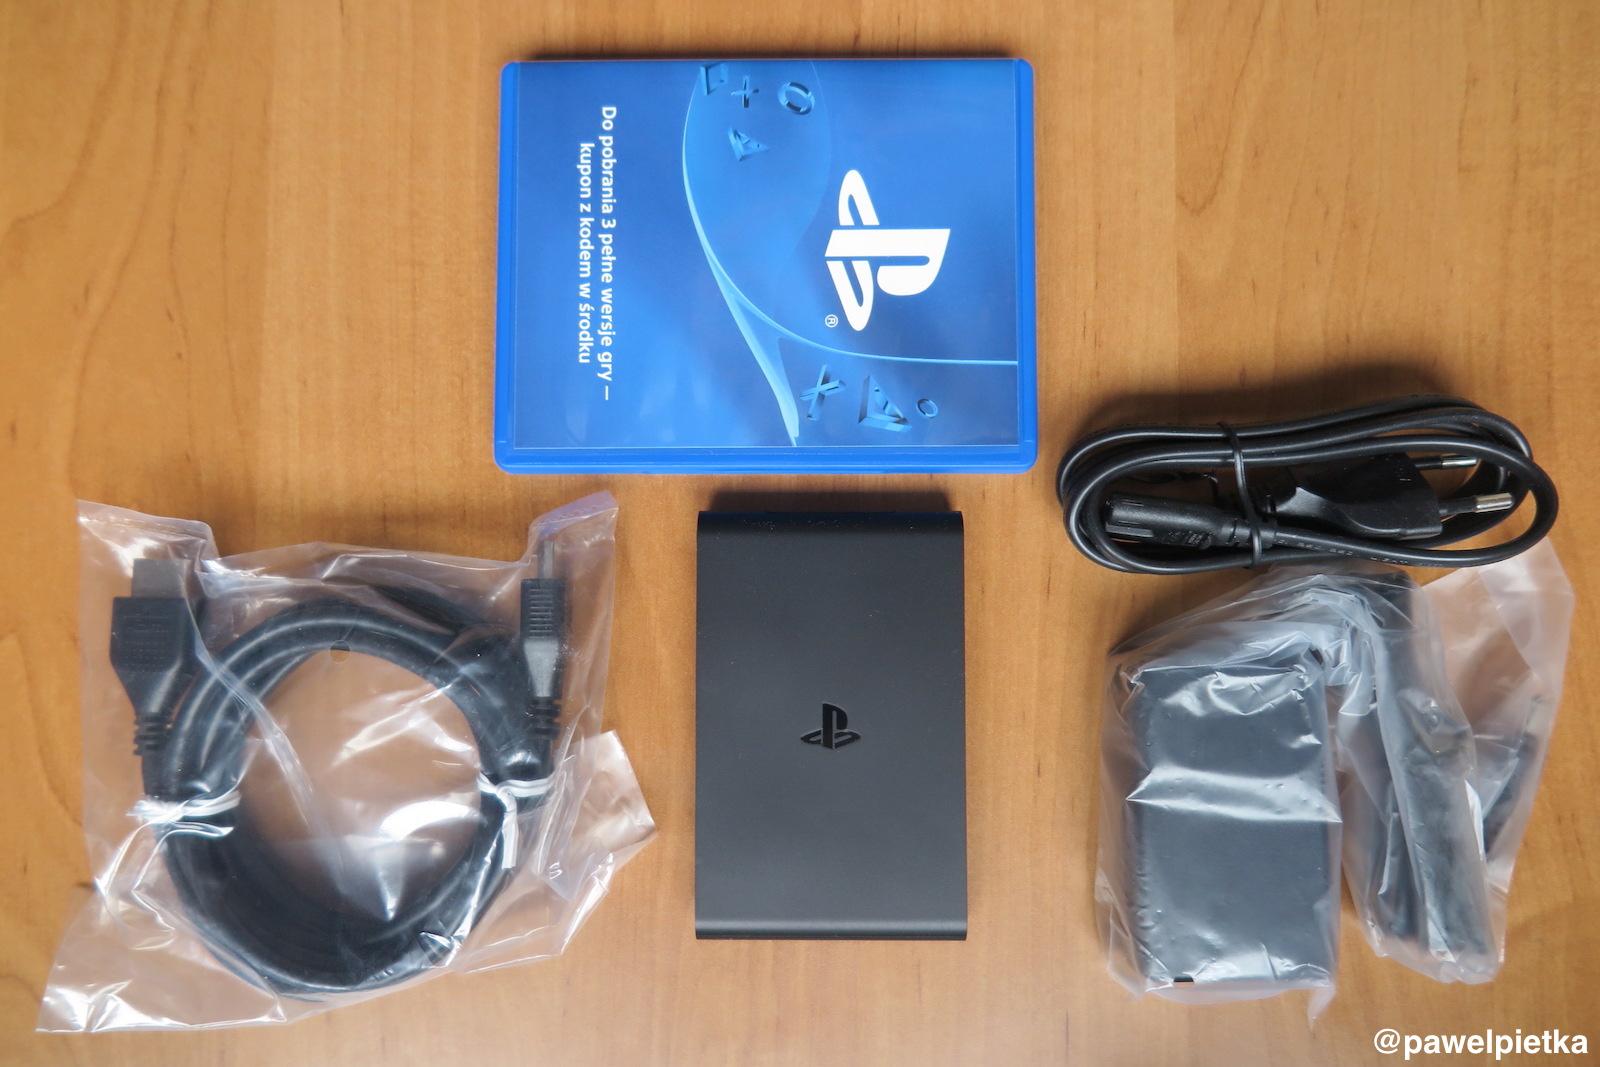 PlayStation TV Vita zawartosc pudelka